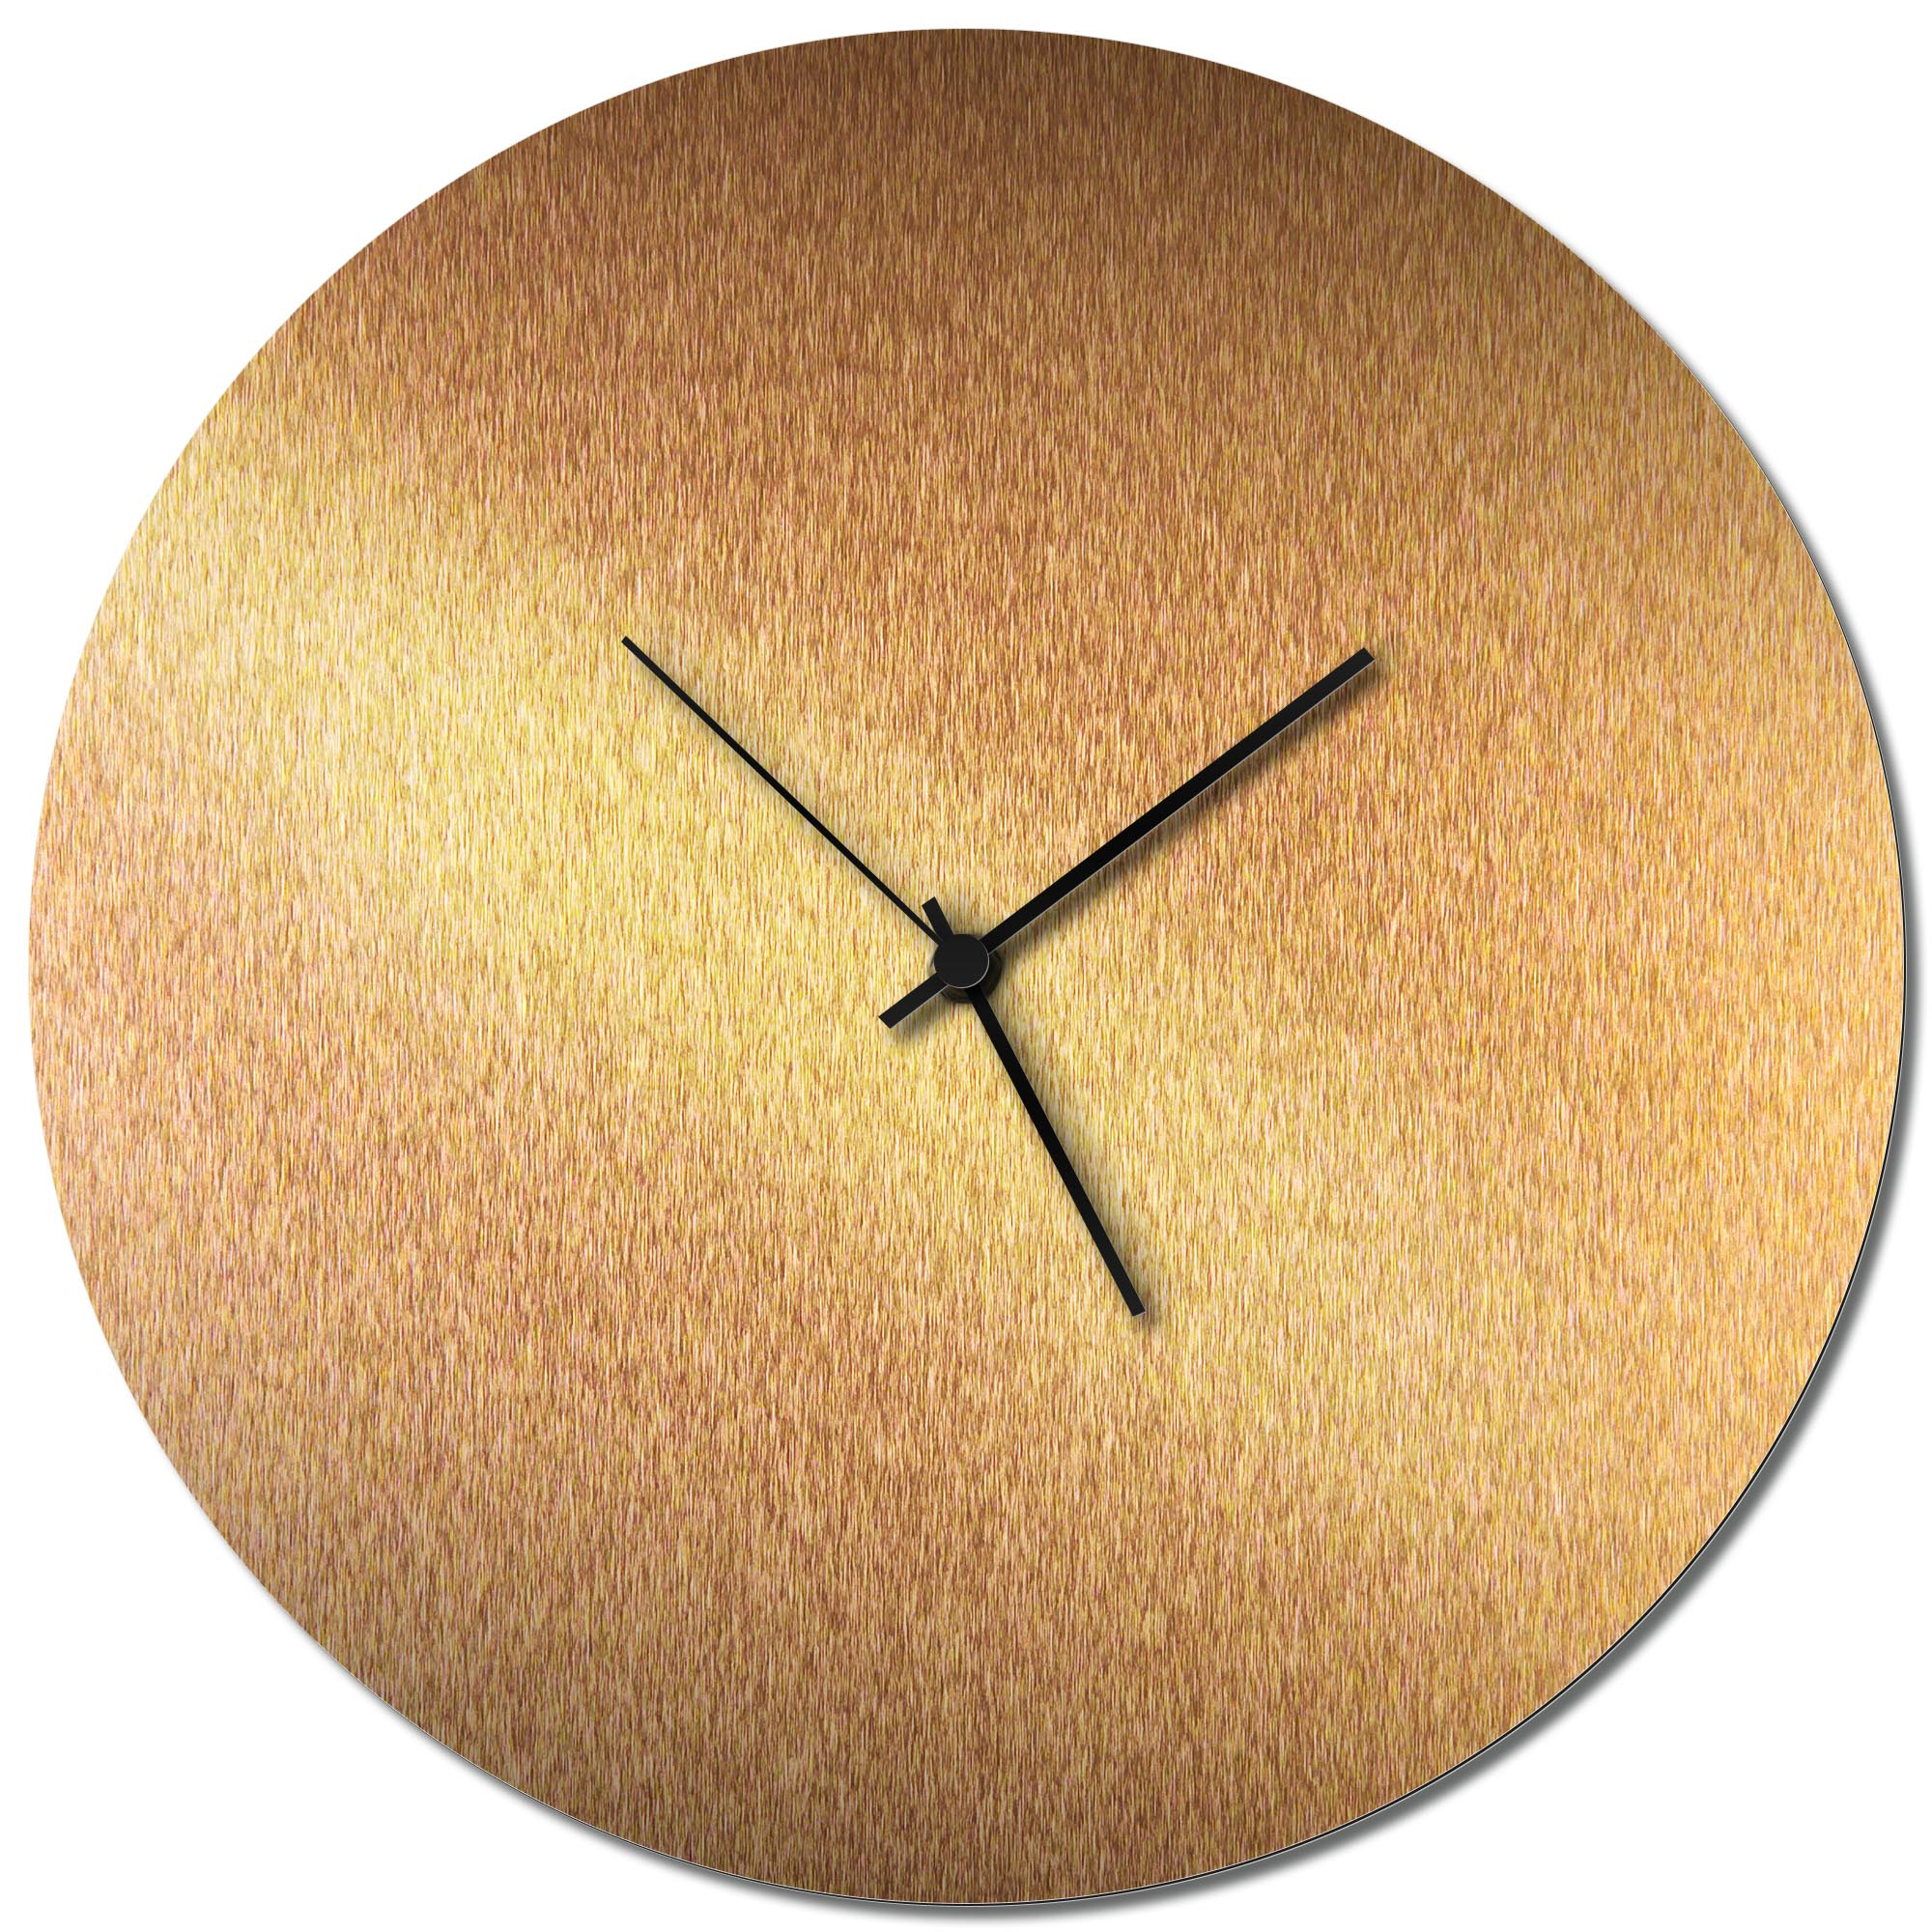 Adam Schwoeppe 'Bronzesmith Circle Clock Black' Midcentury Modern Style Wall Clock